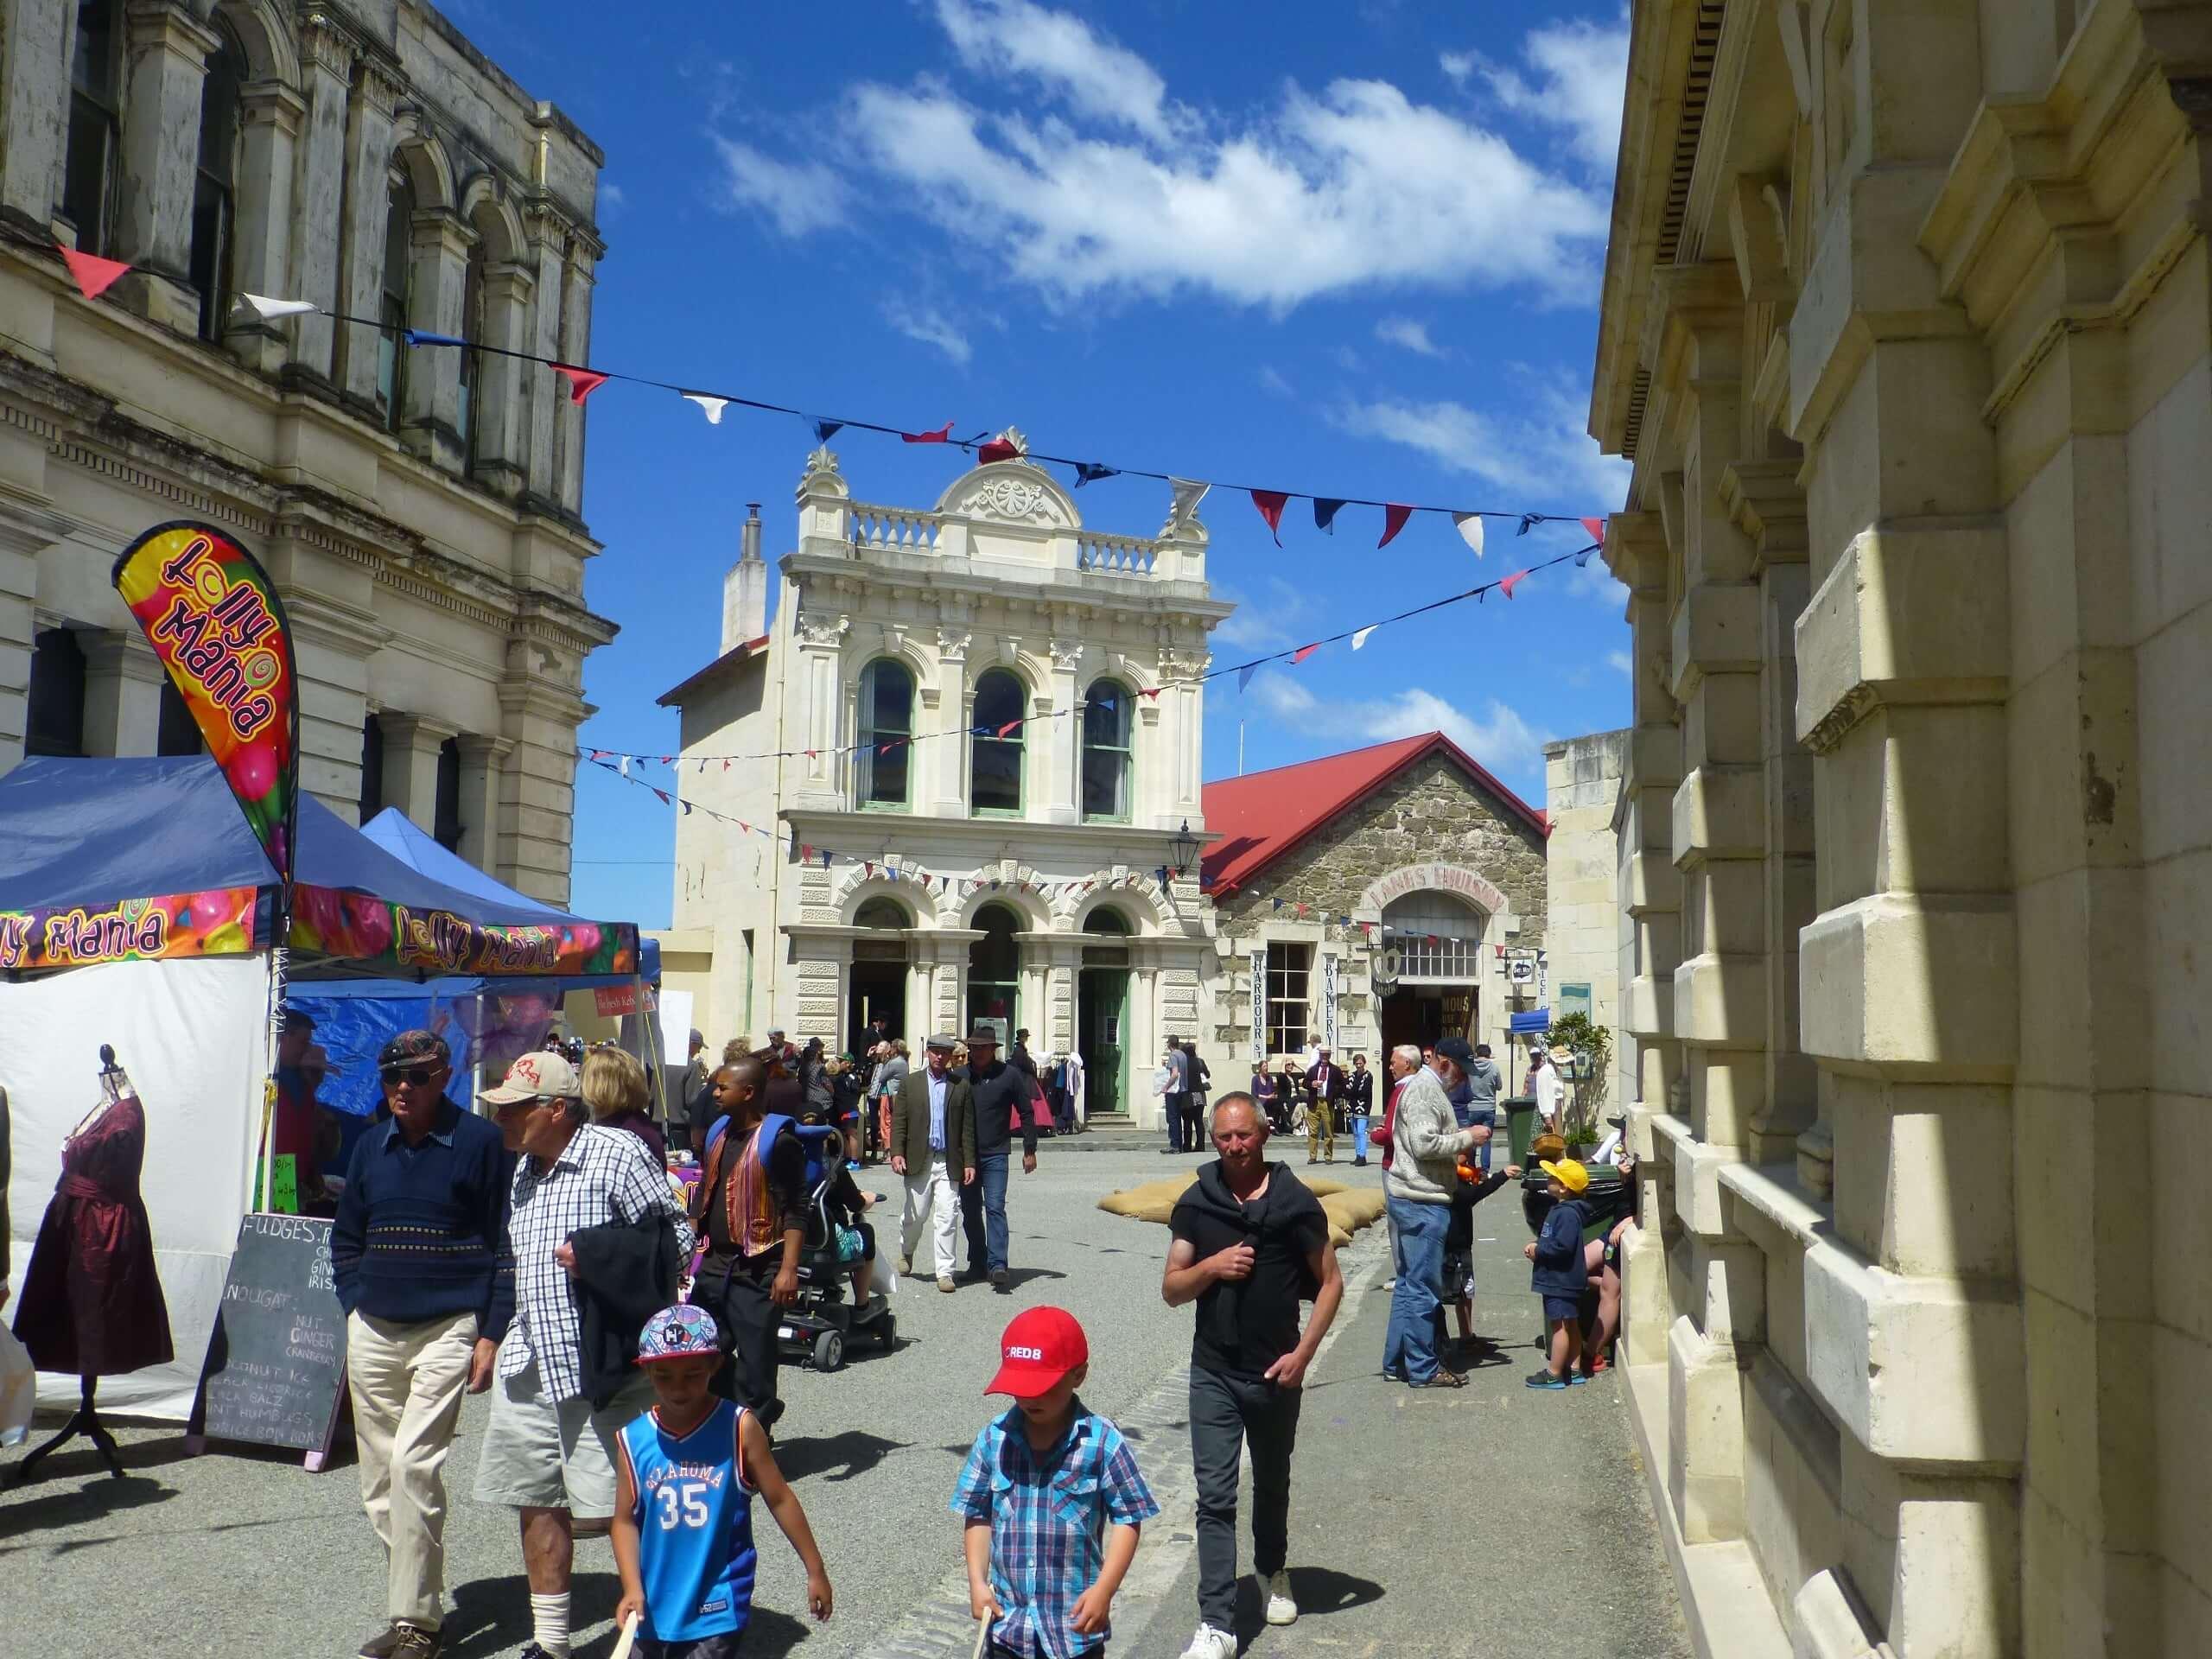 Viktorian Festival in Oamaru 15